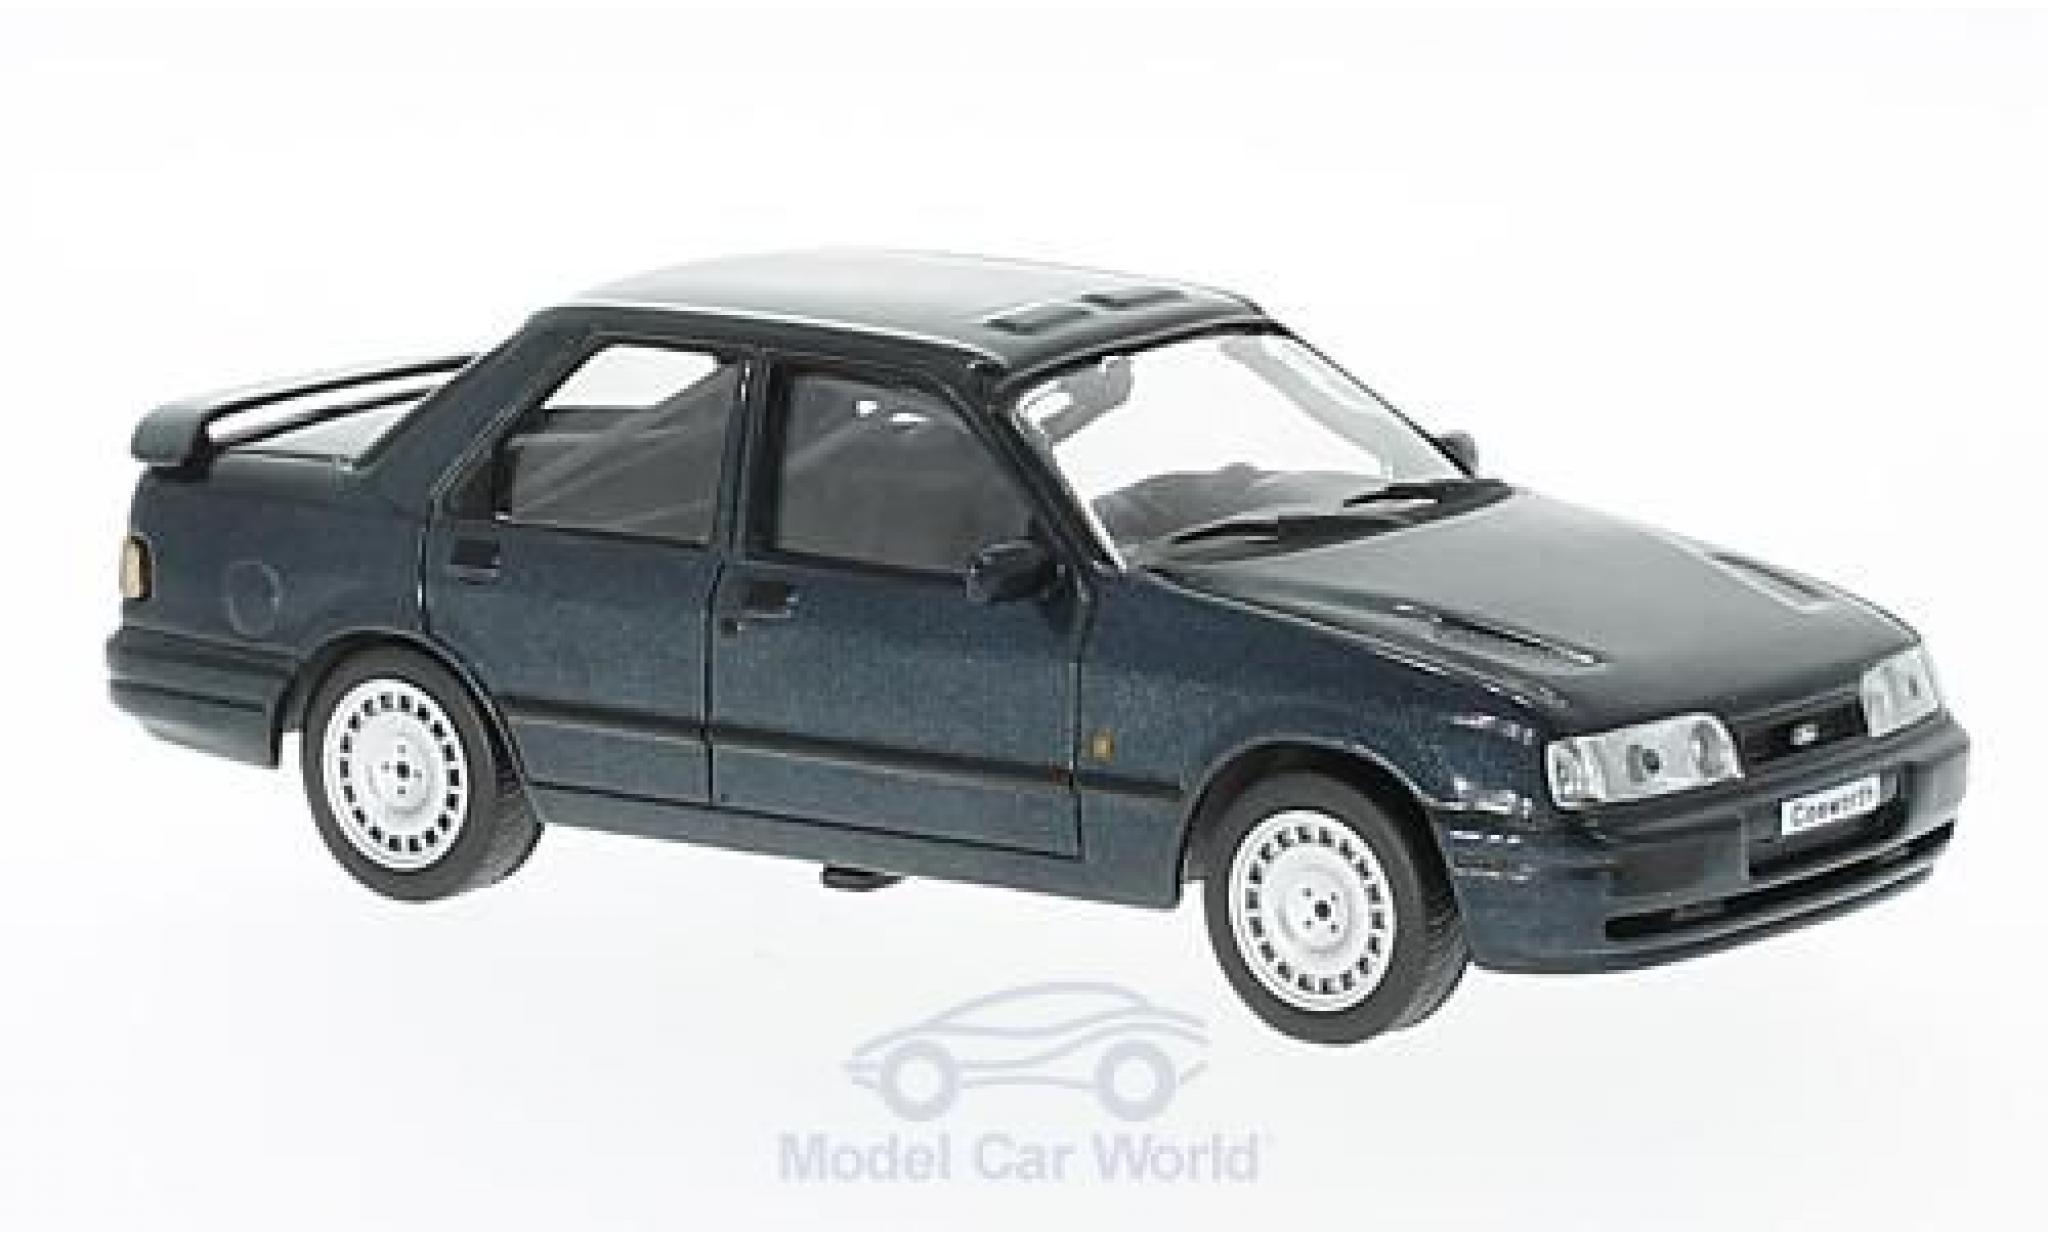 Ford Sierra Cosworth 1/43 WhiteBox metallise grise 1990